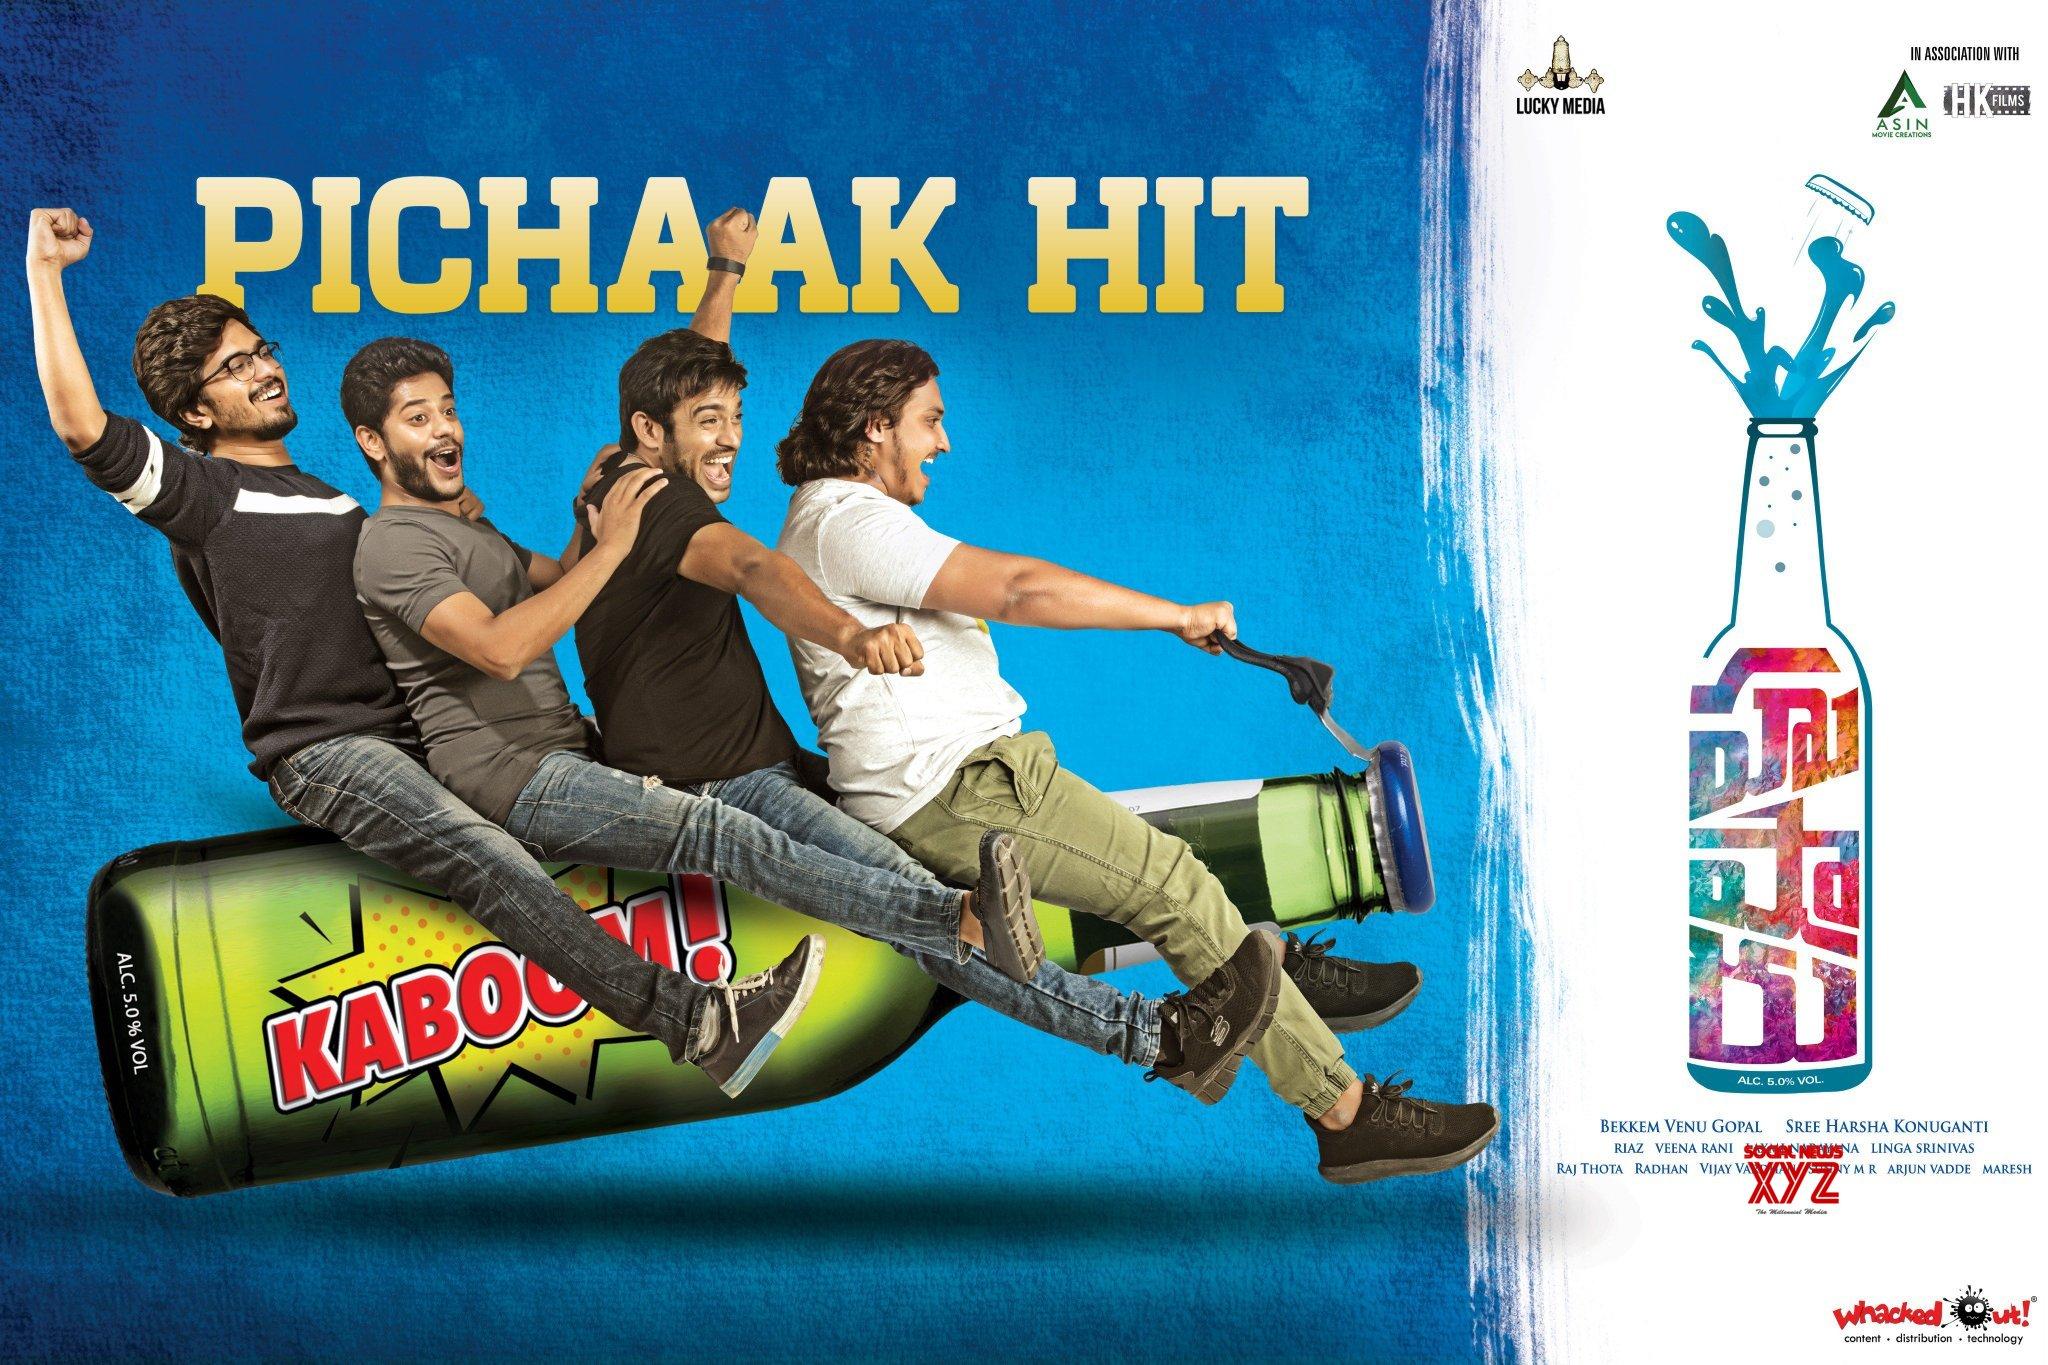 Hushaaru Movie PICHAAK HIT Poster